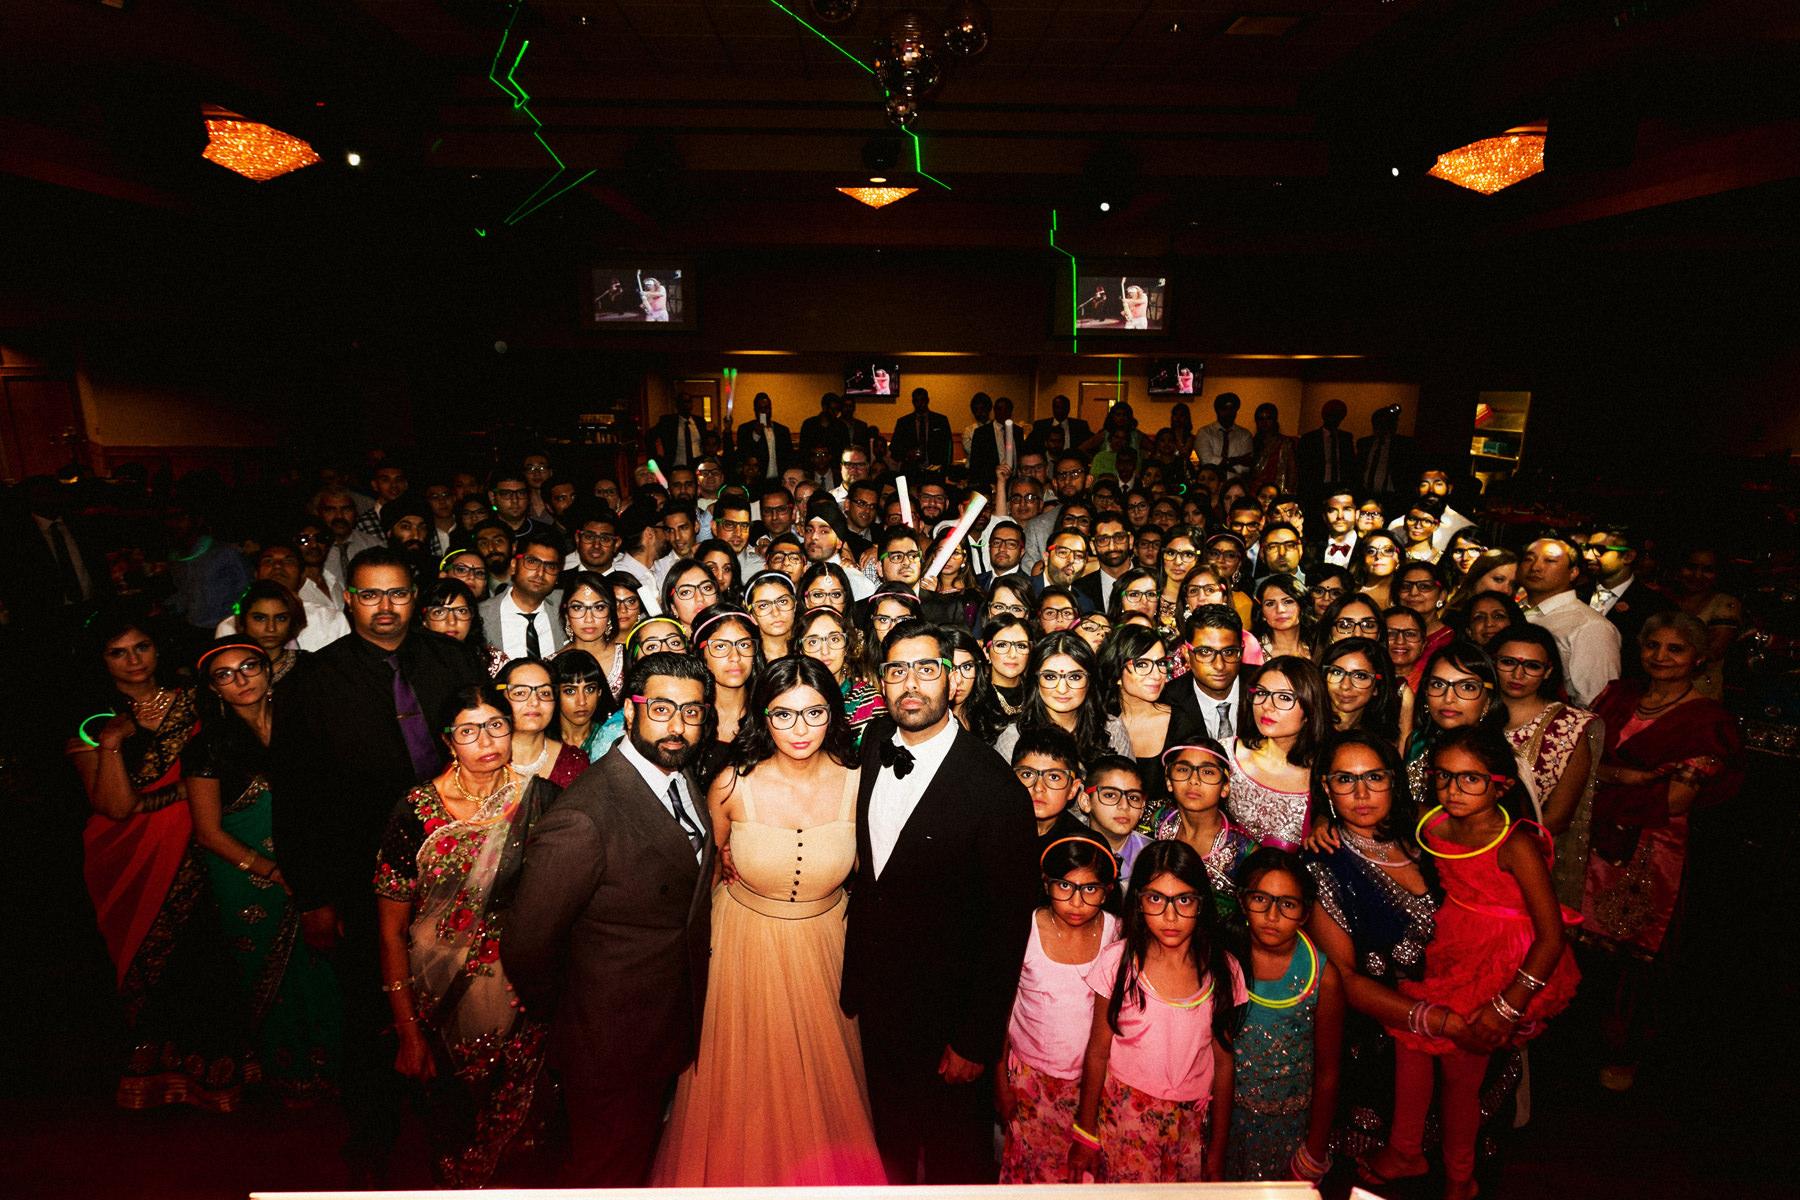 aldergrove hindu personals Meet thousands of beautiful single women personals online seeking men for dating, love, marriage in canada.